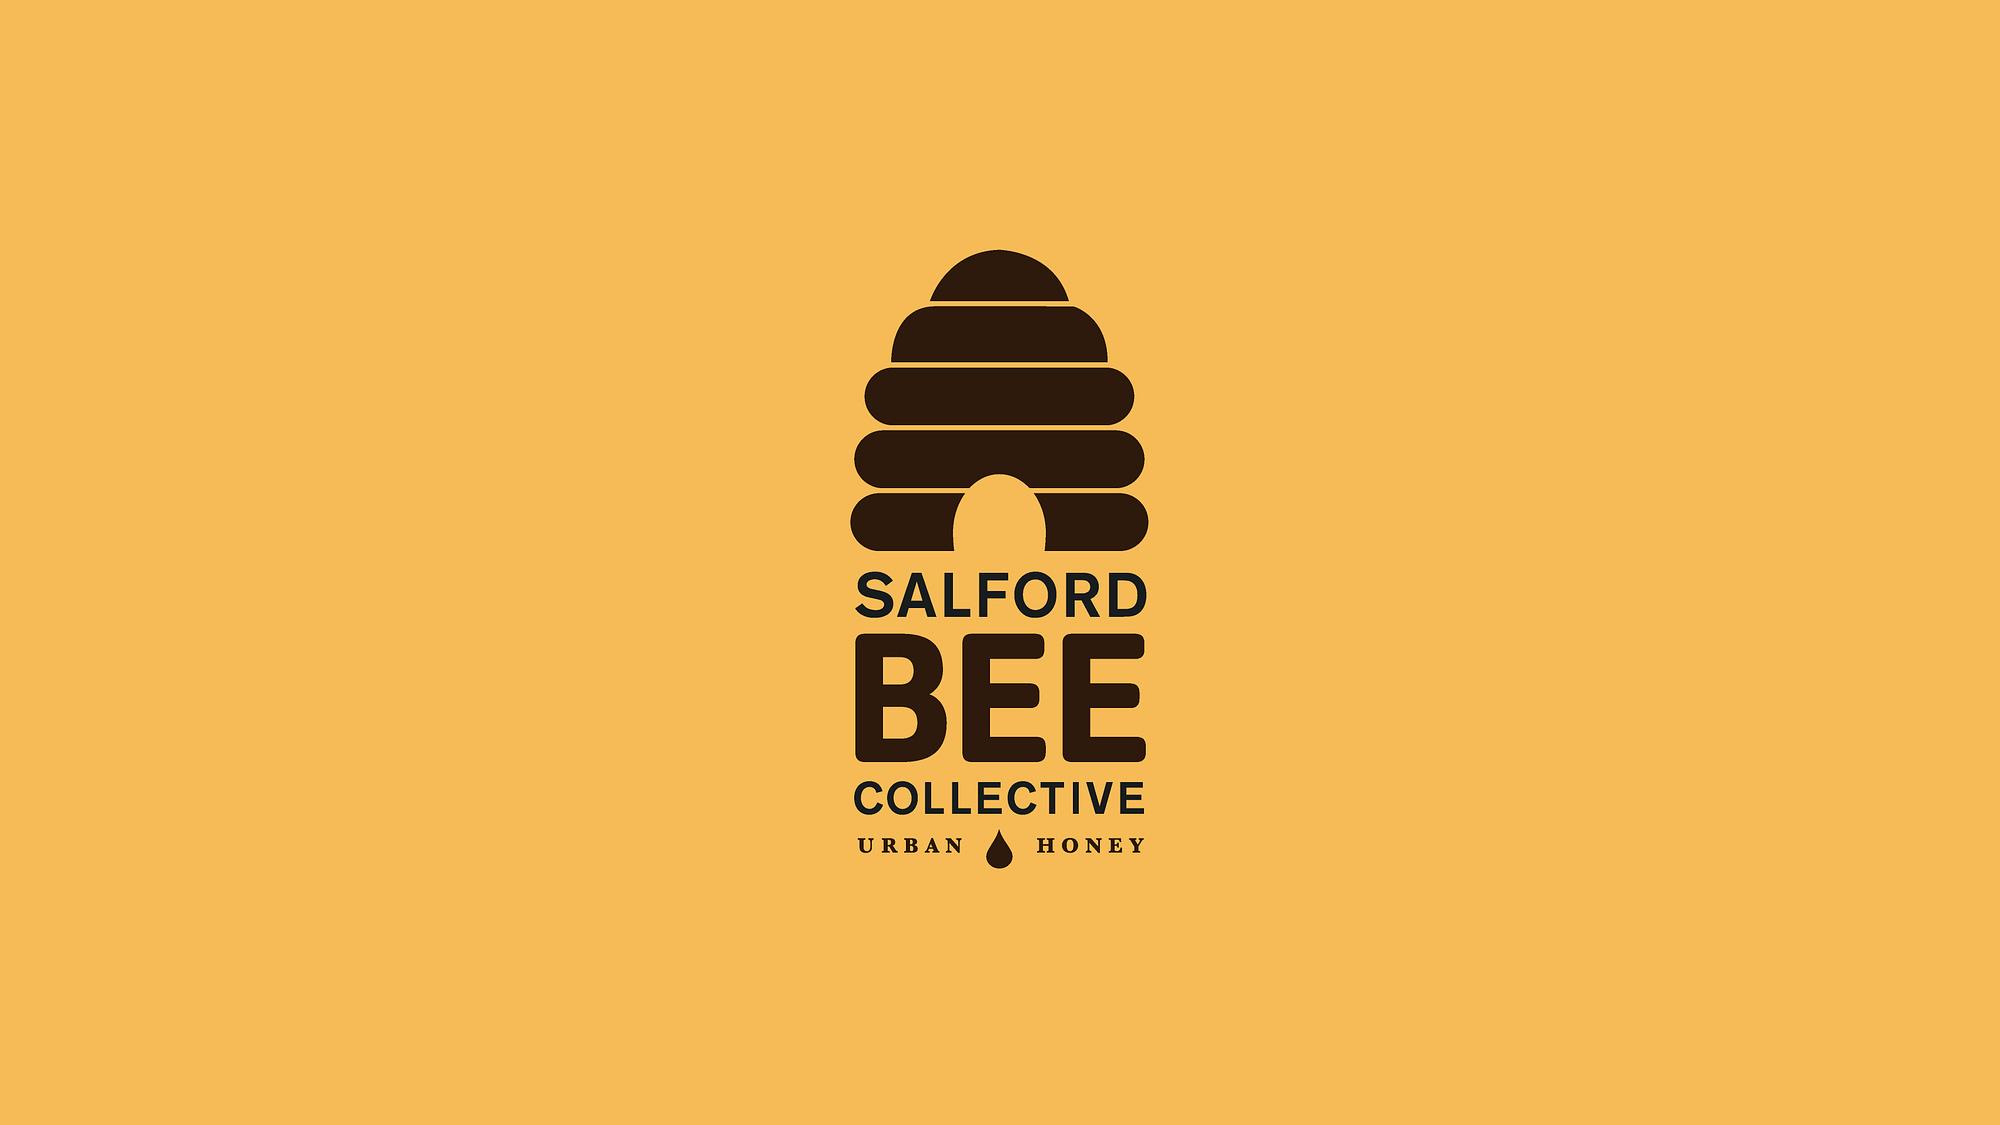 Salford Bee Collective logo